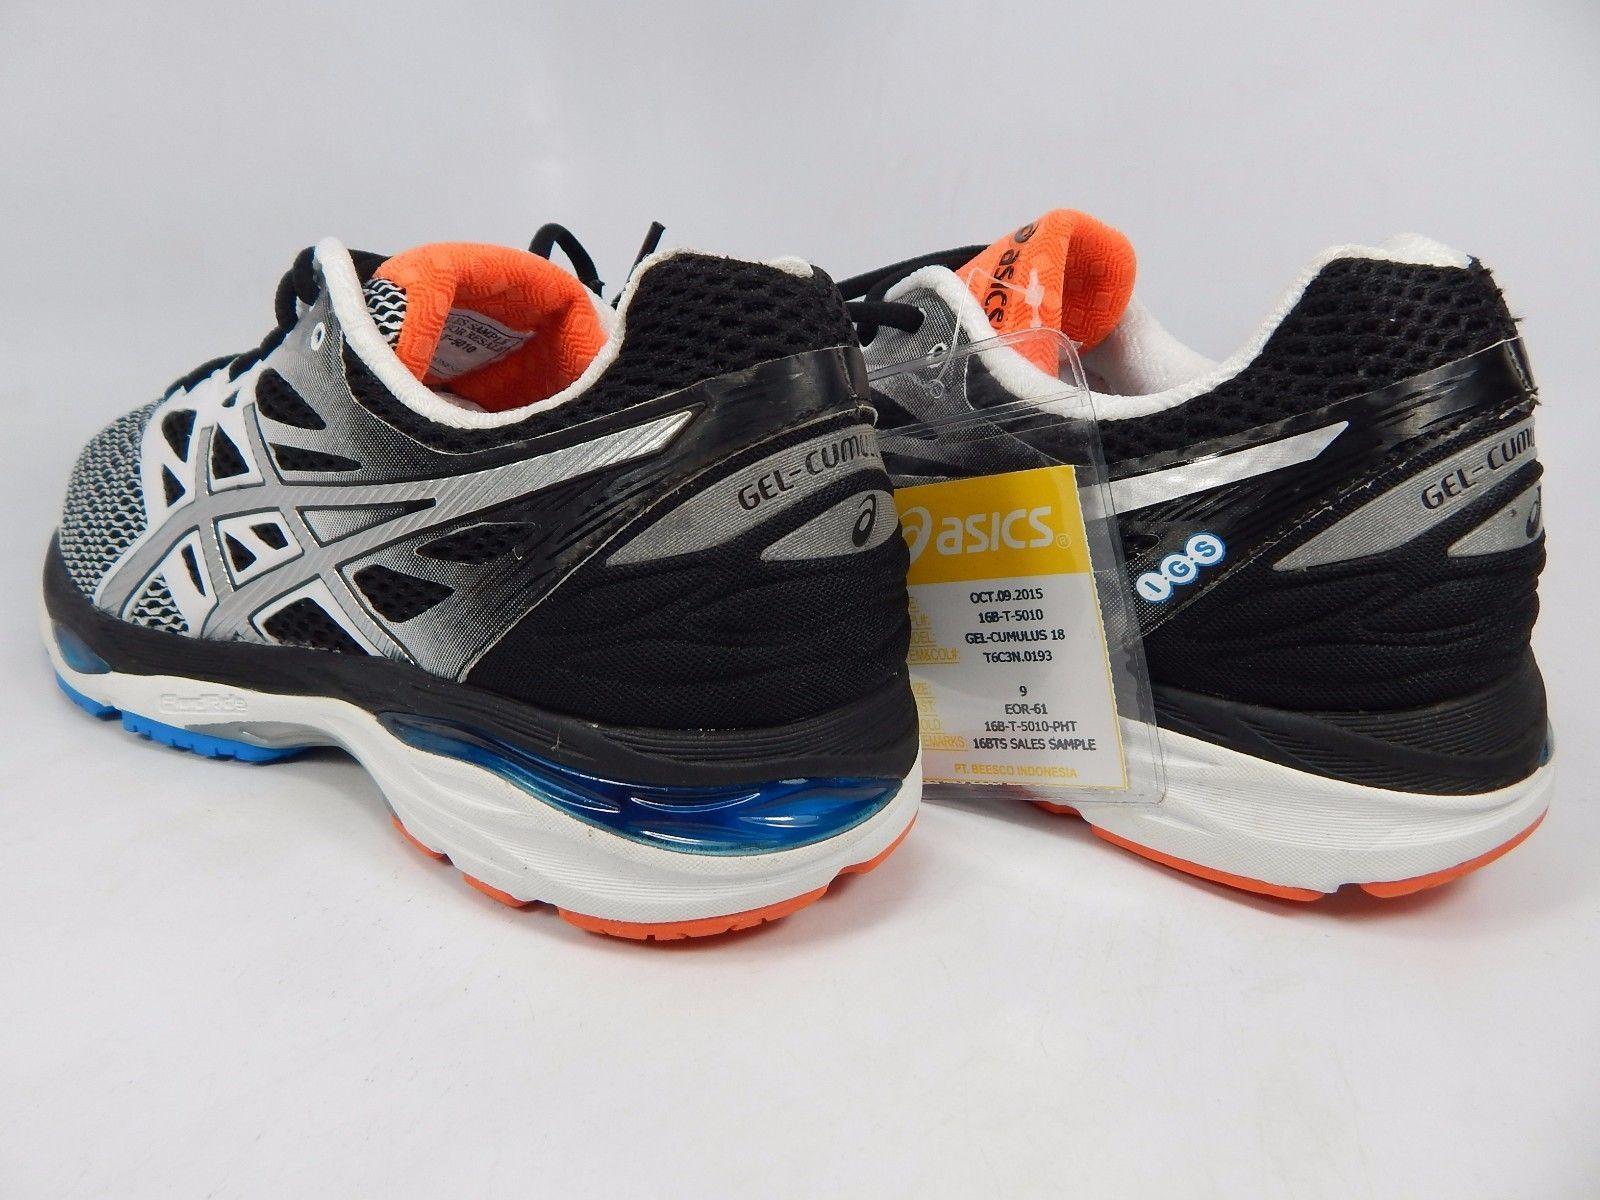 Asics Gel Cumulus 18 Men's Running Shoes Sample Size US 9 M (D) EU 42.5 White